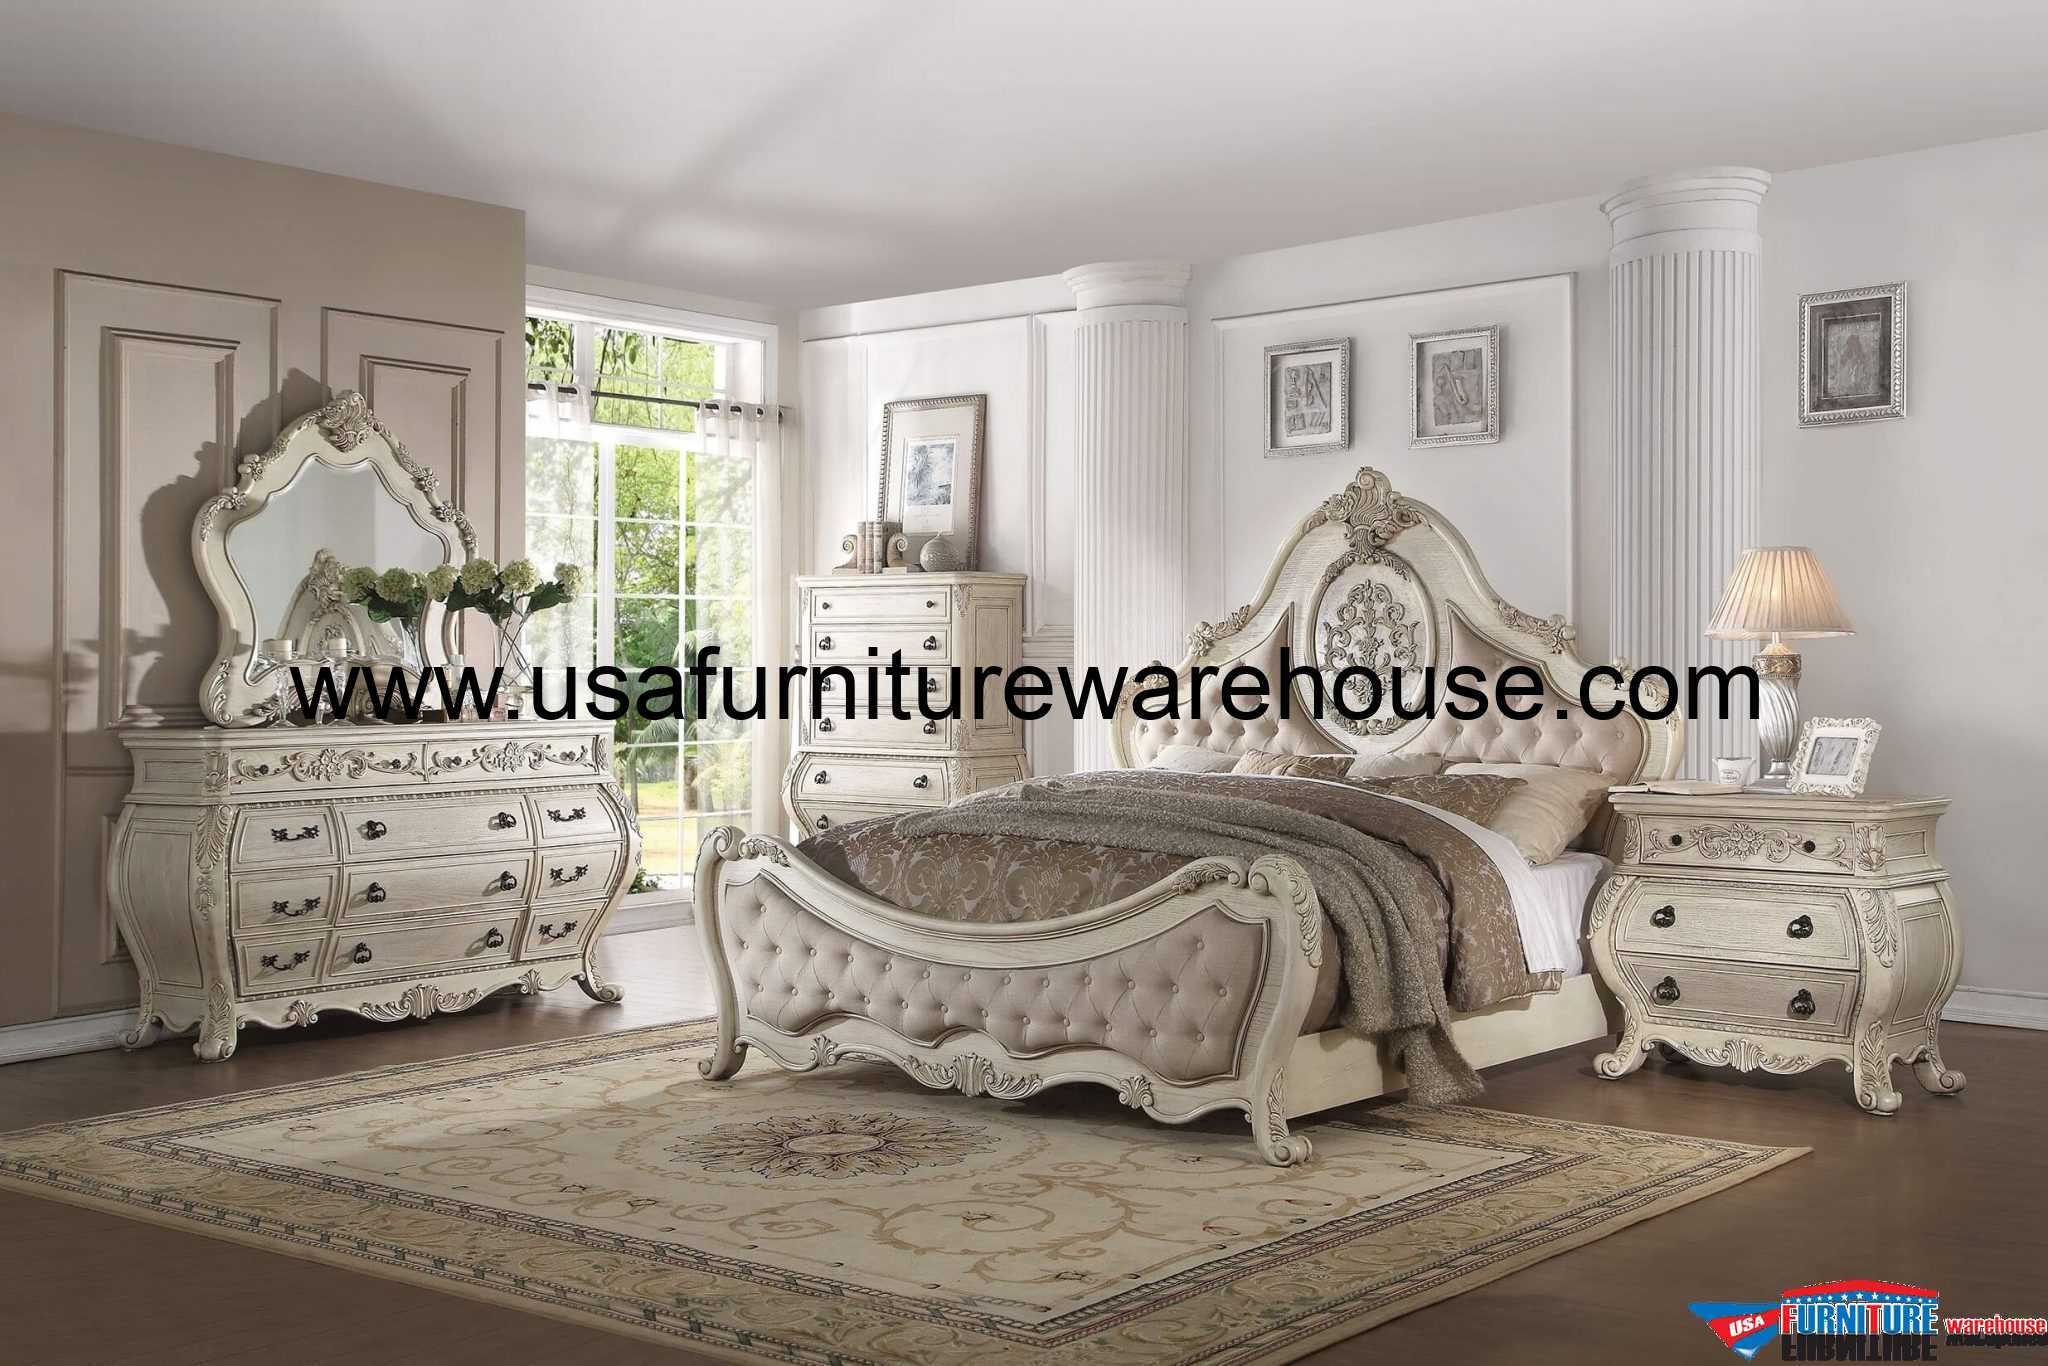 4 Piece Acme Ragenardus Antique White Bedroom Set - USA Furniture ...